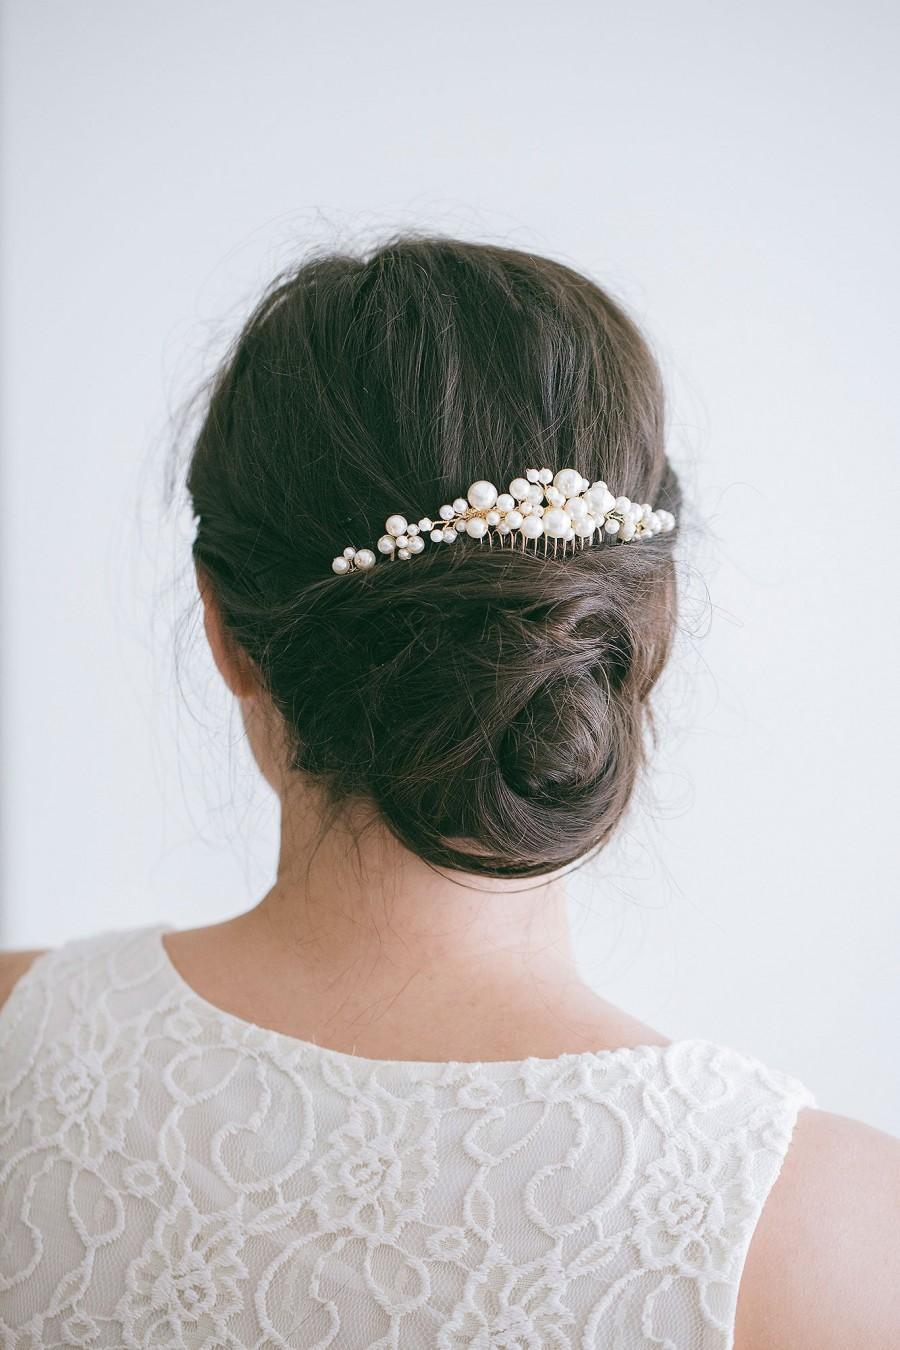 Wedding - Bridal Gold Pearl Hair Comb, Wedding Hair Comb, Bridal Hair Comb, Wedding Back Comb, Veil Decoration, RosyRoseStudio